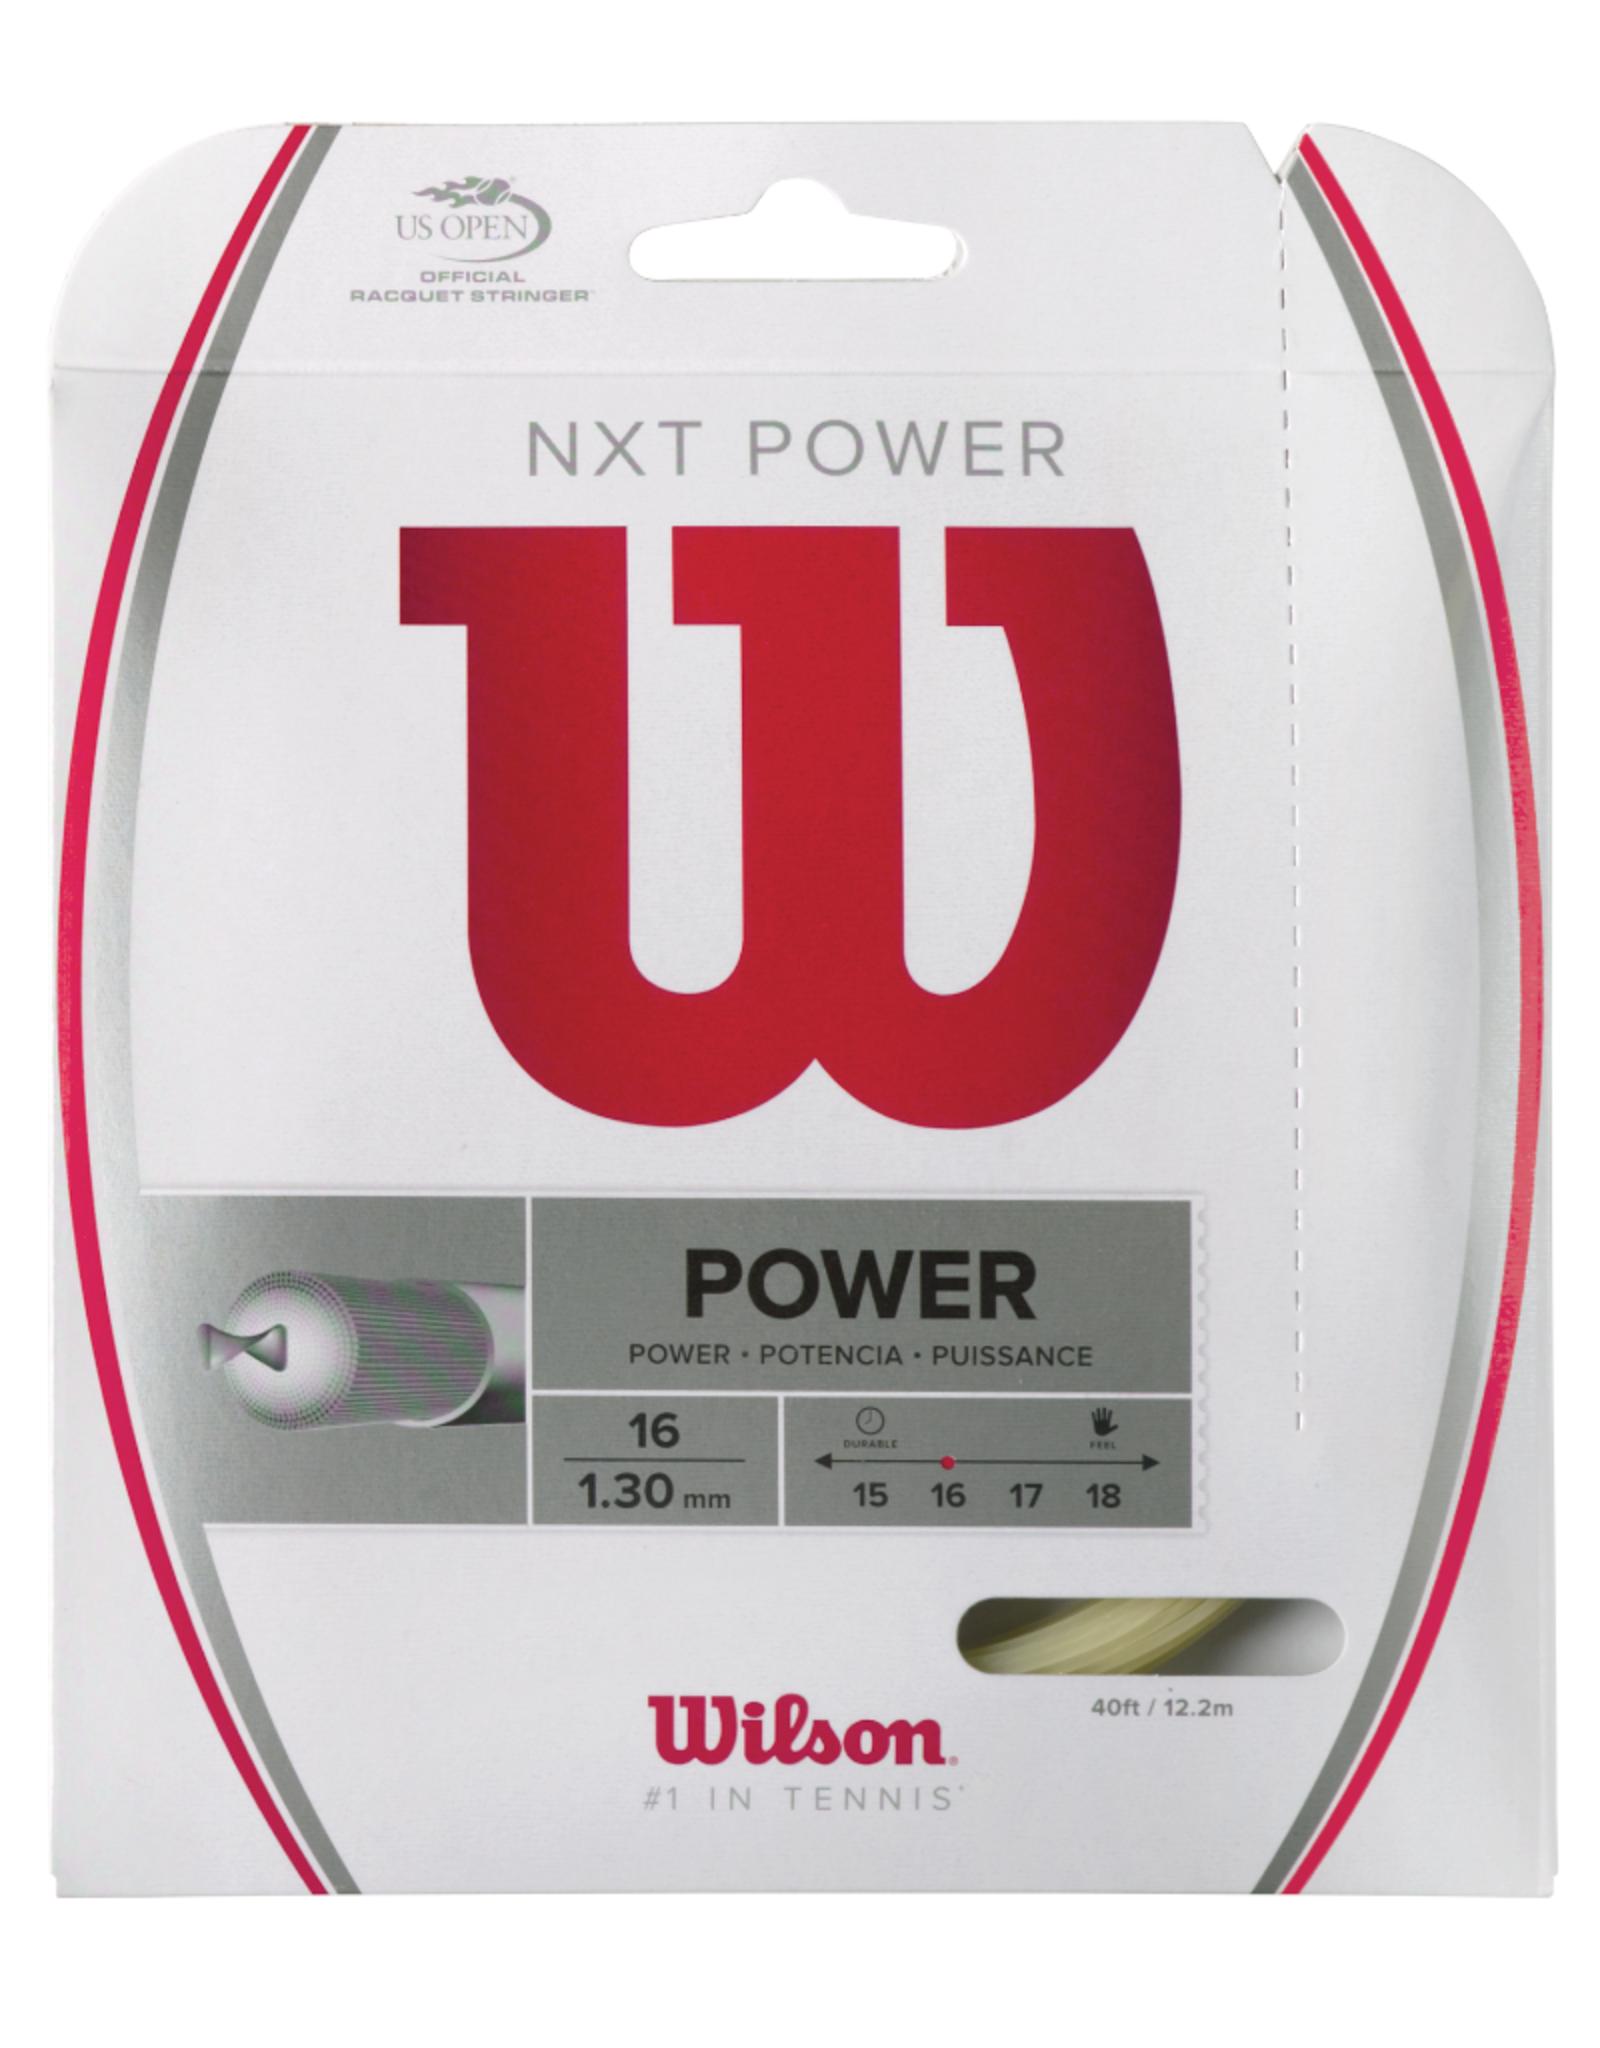 WILSON NXT POWER 16 FULL SET (NATURAL)